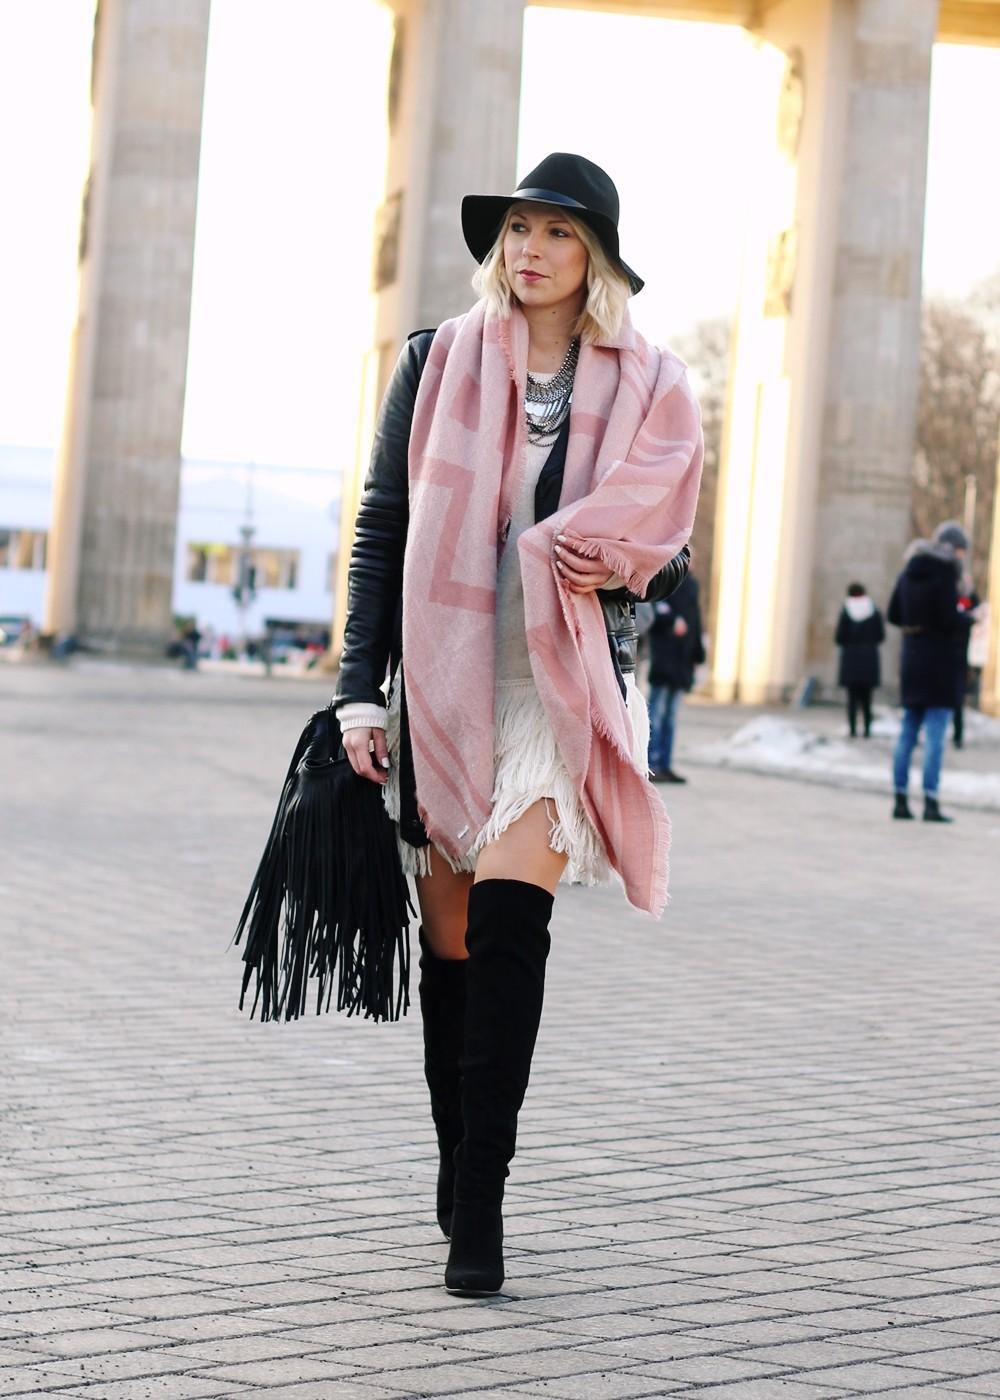 Fashion Week Berlin 2016 Outfit OOTD Fransen Strickkleid Lederjacke Overknees Schal Hut Fransentasche 5